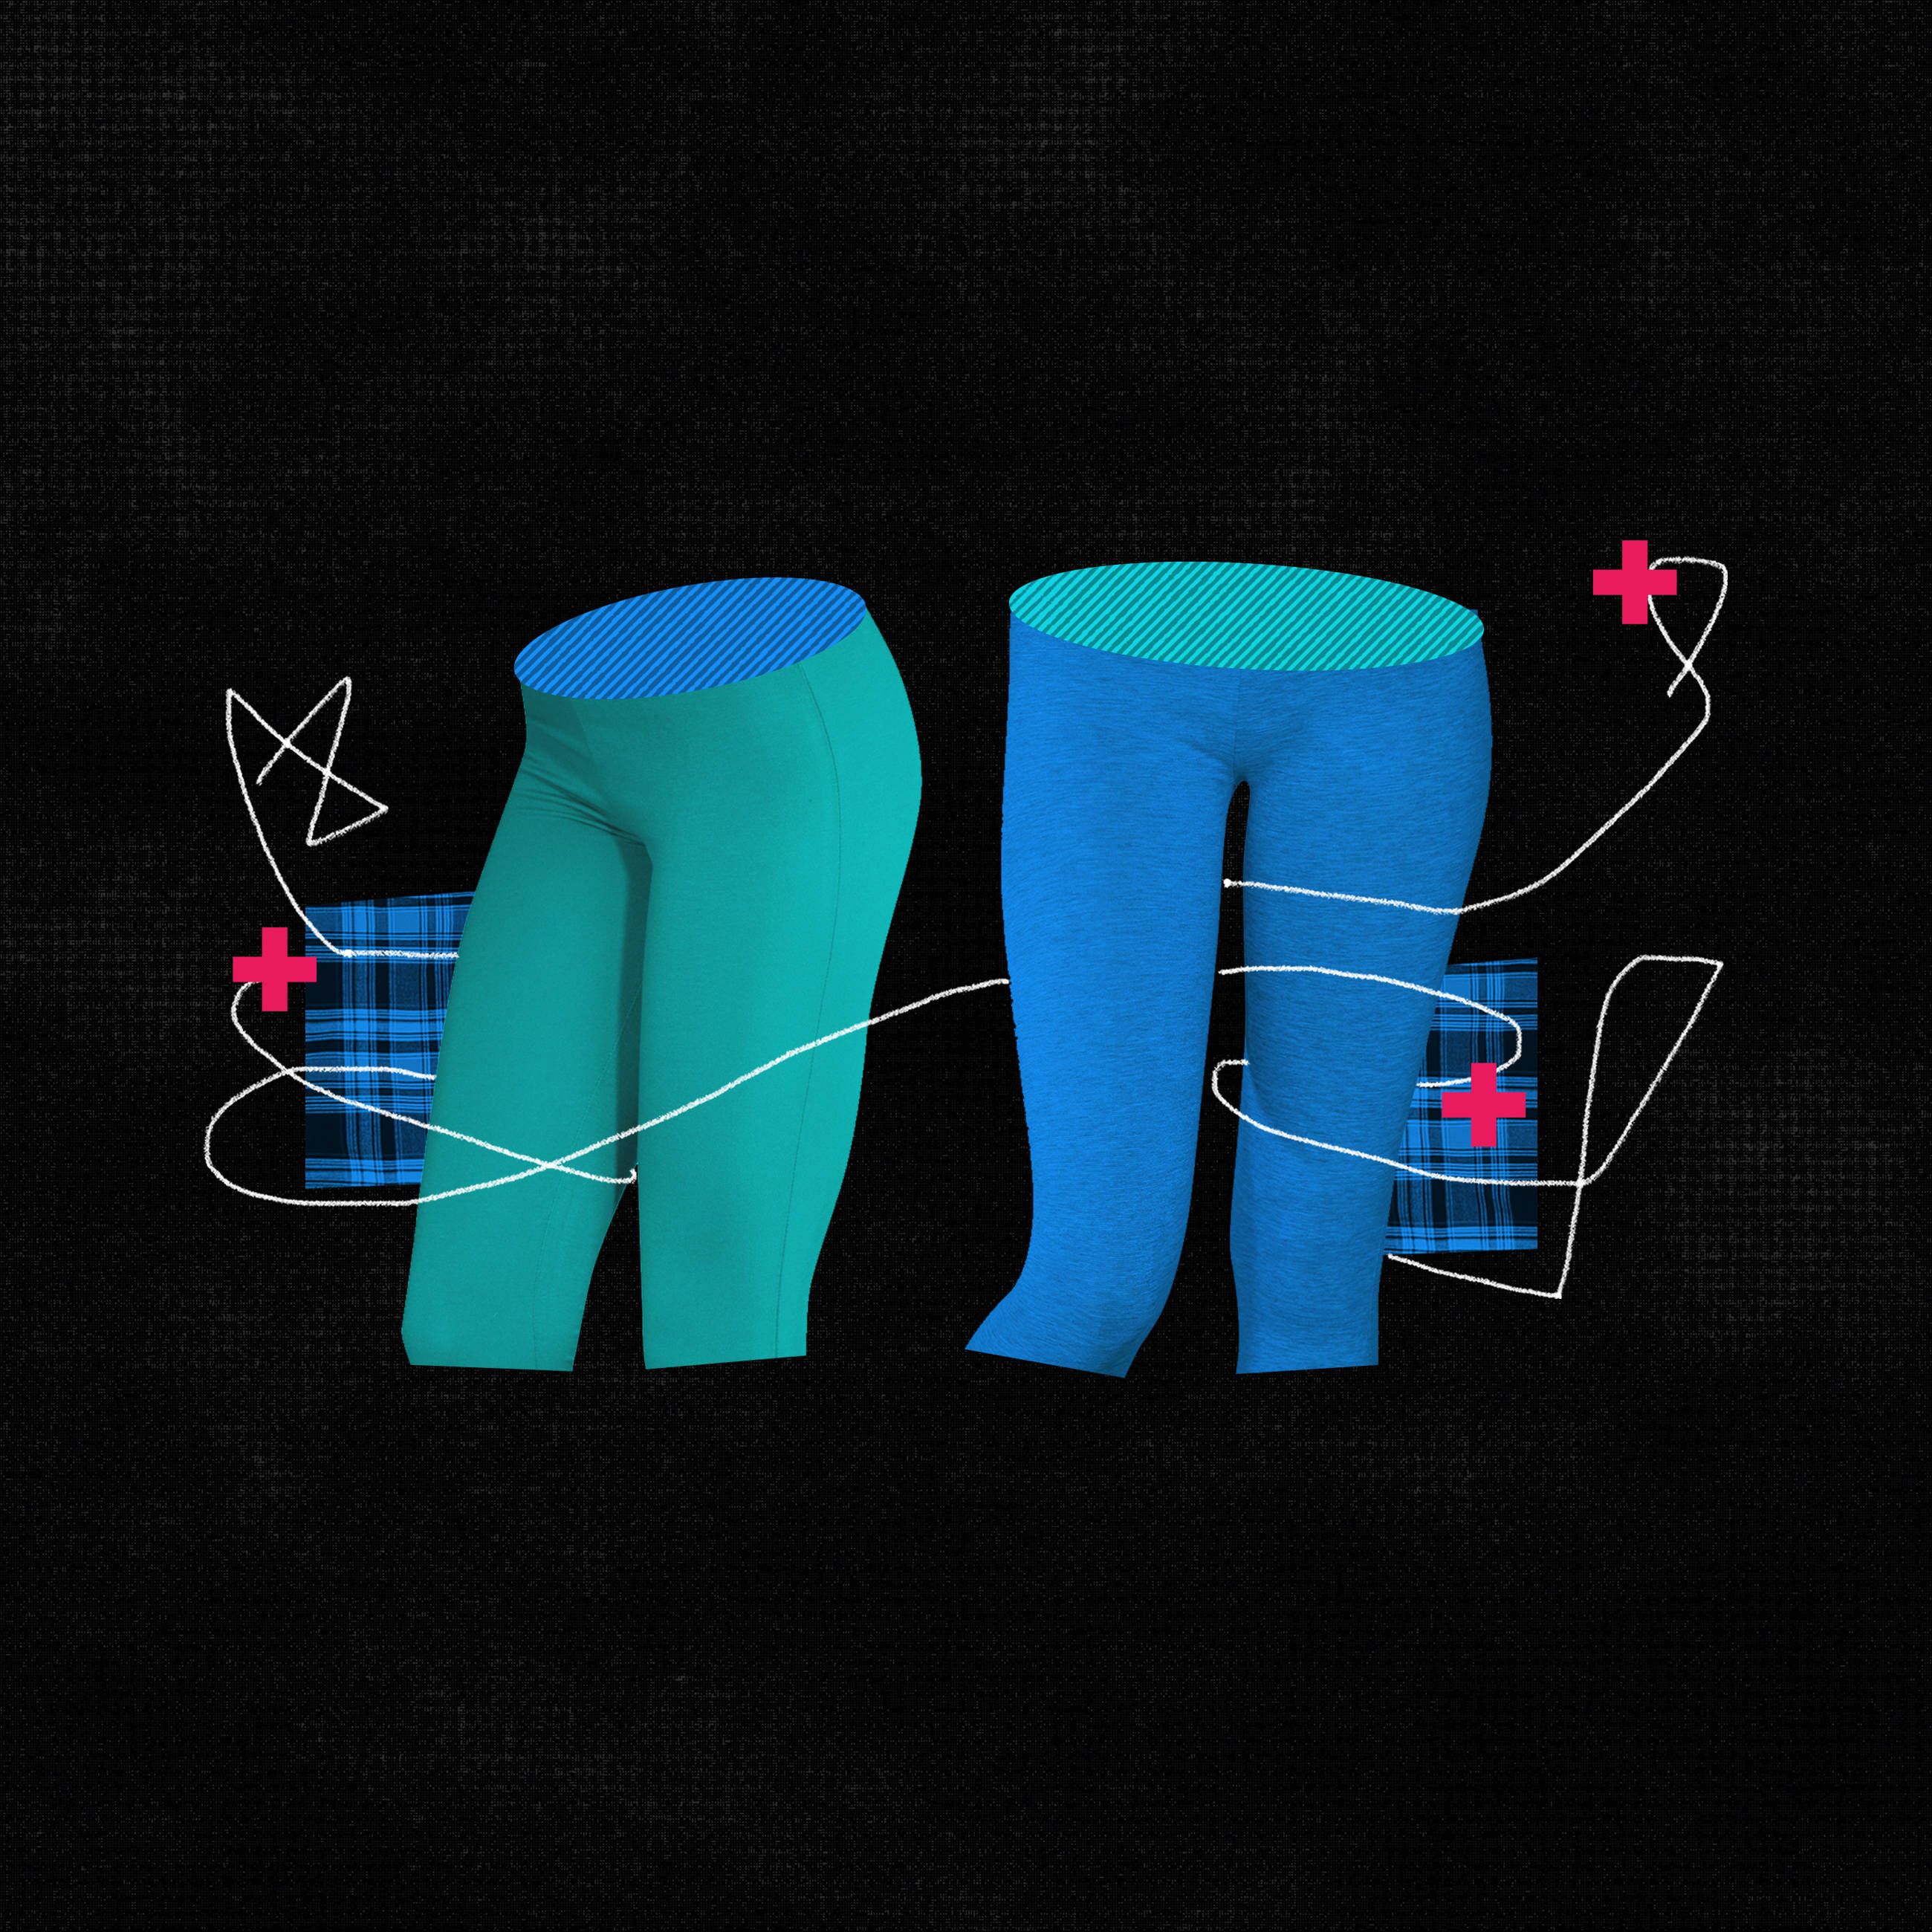 (iStock; Lily illustration)